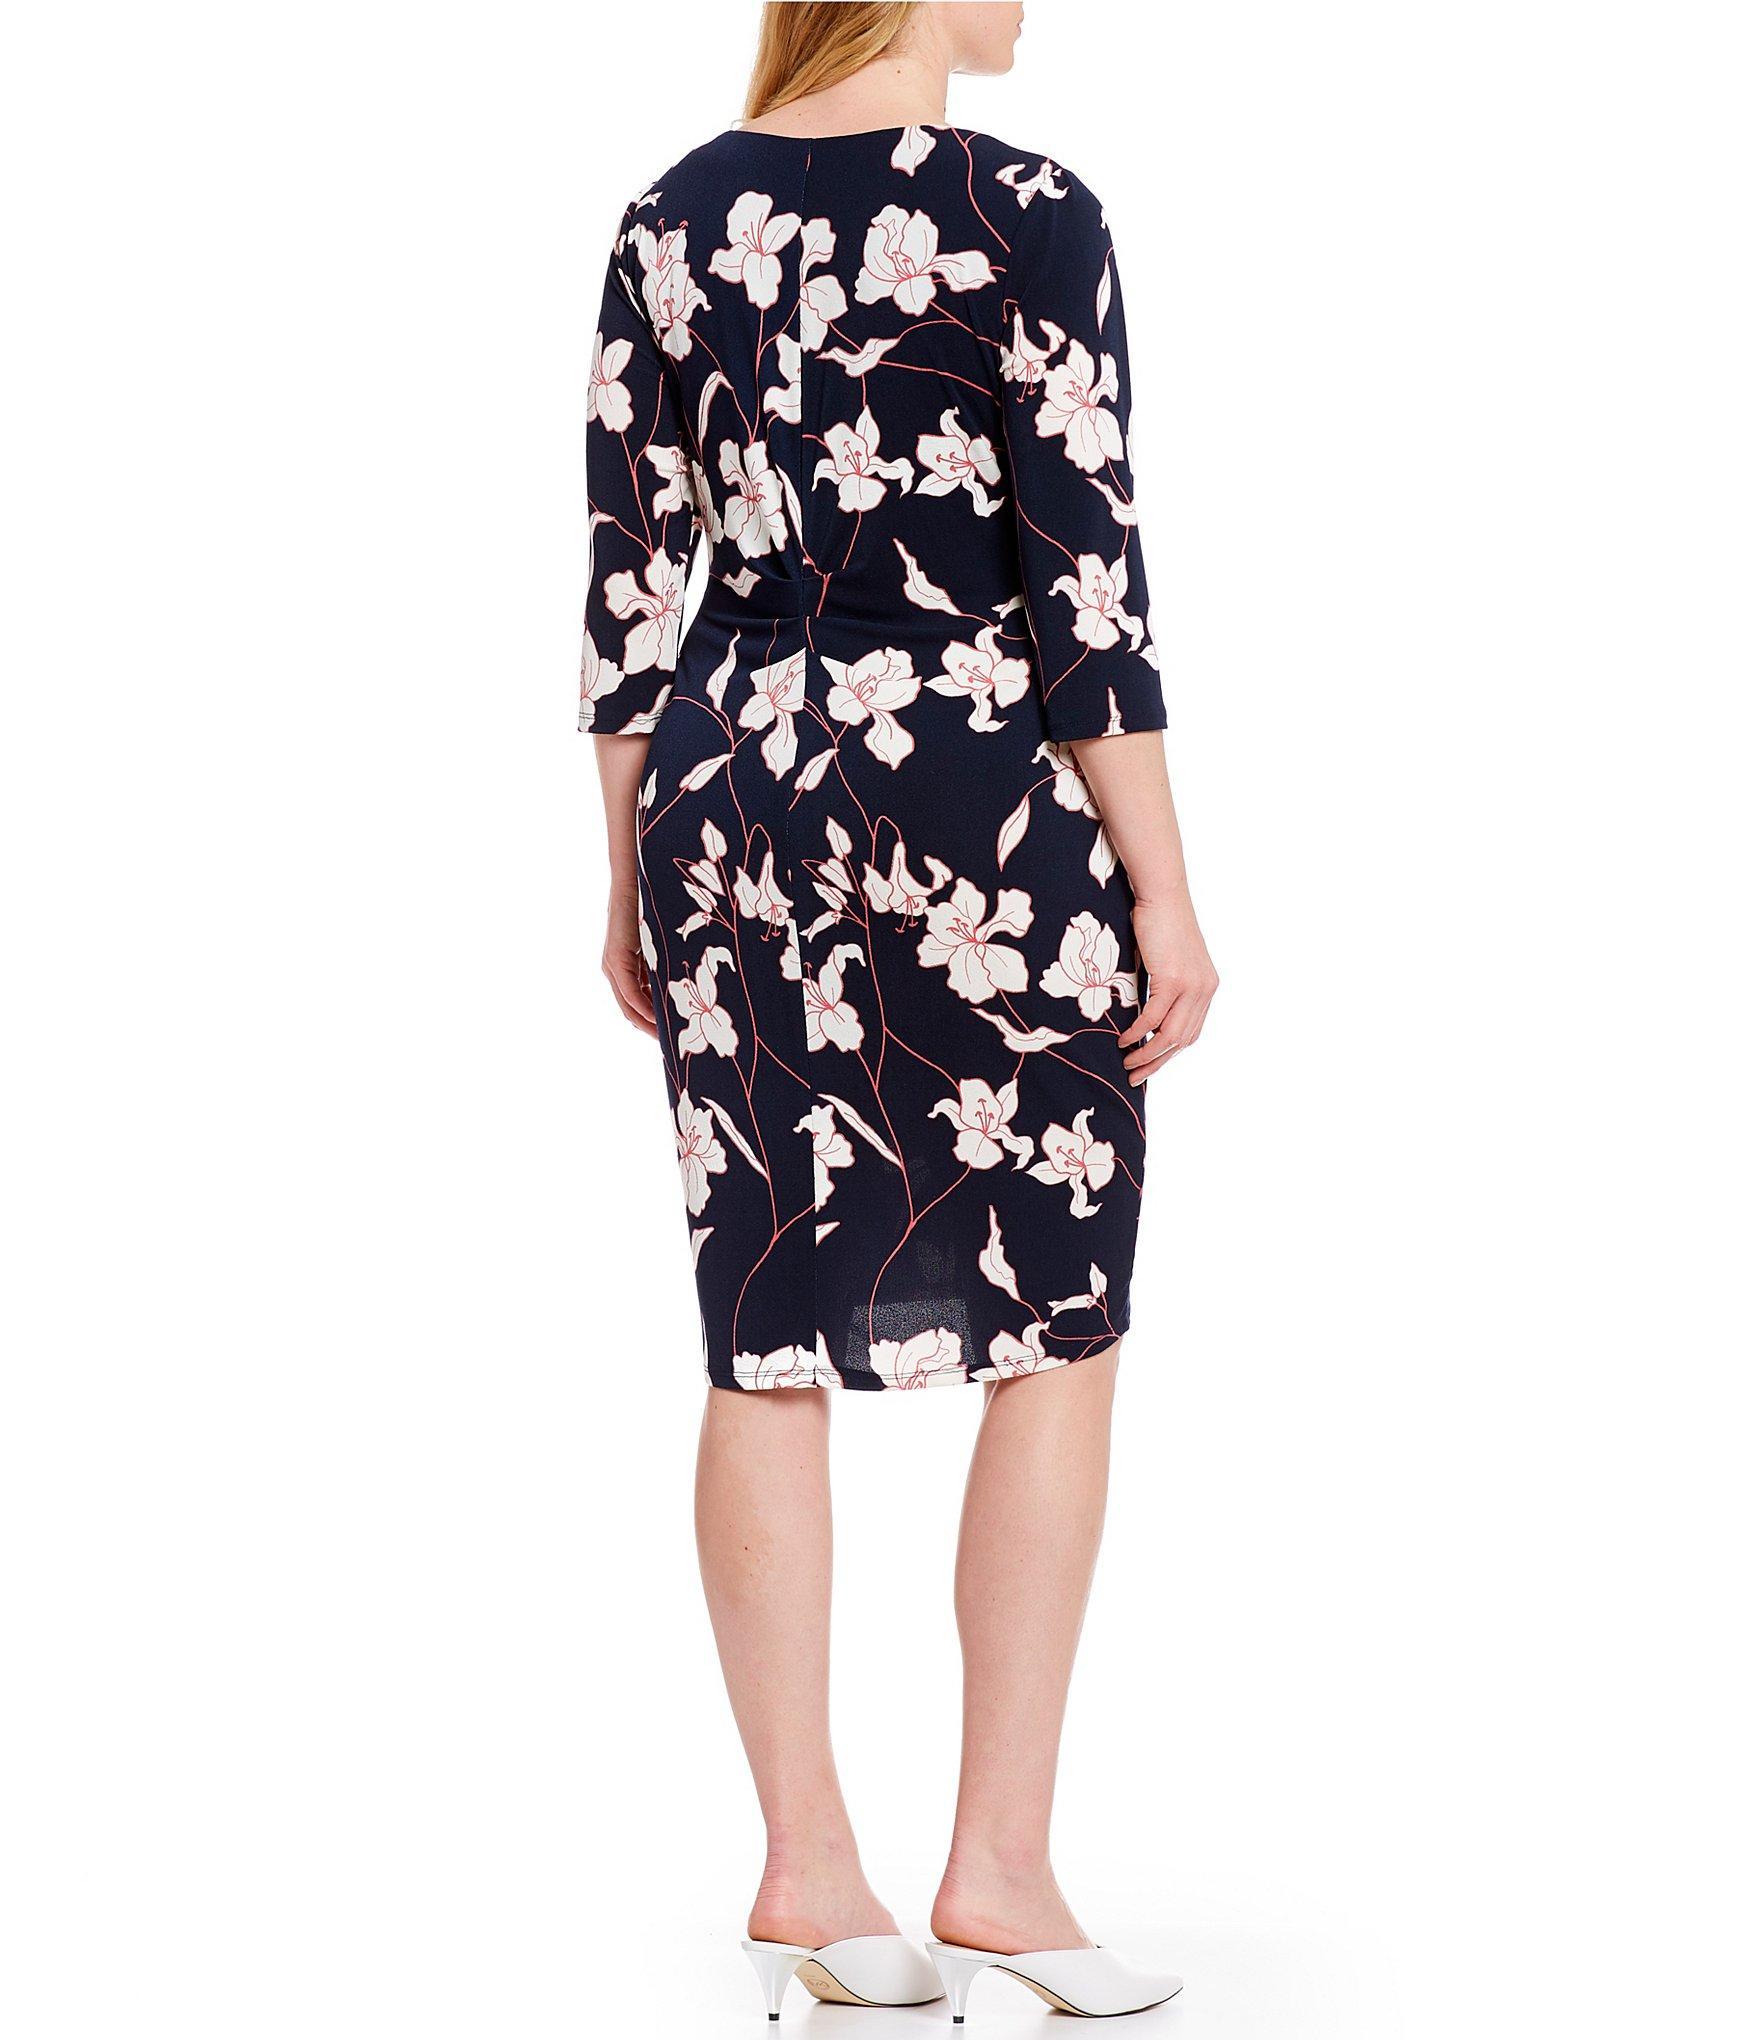 c8fec6dfa2f Adrianna Papell - Blue Plus Size Floral Print 3 4 Sleeve Sheath Dress -  Lyst. View fullscreen